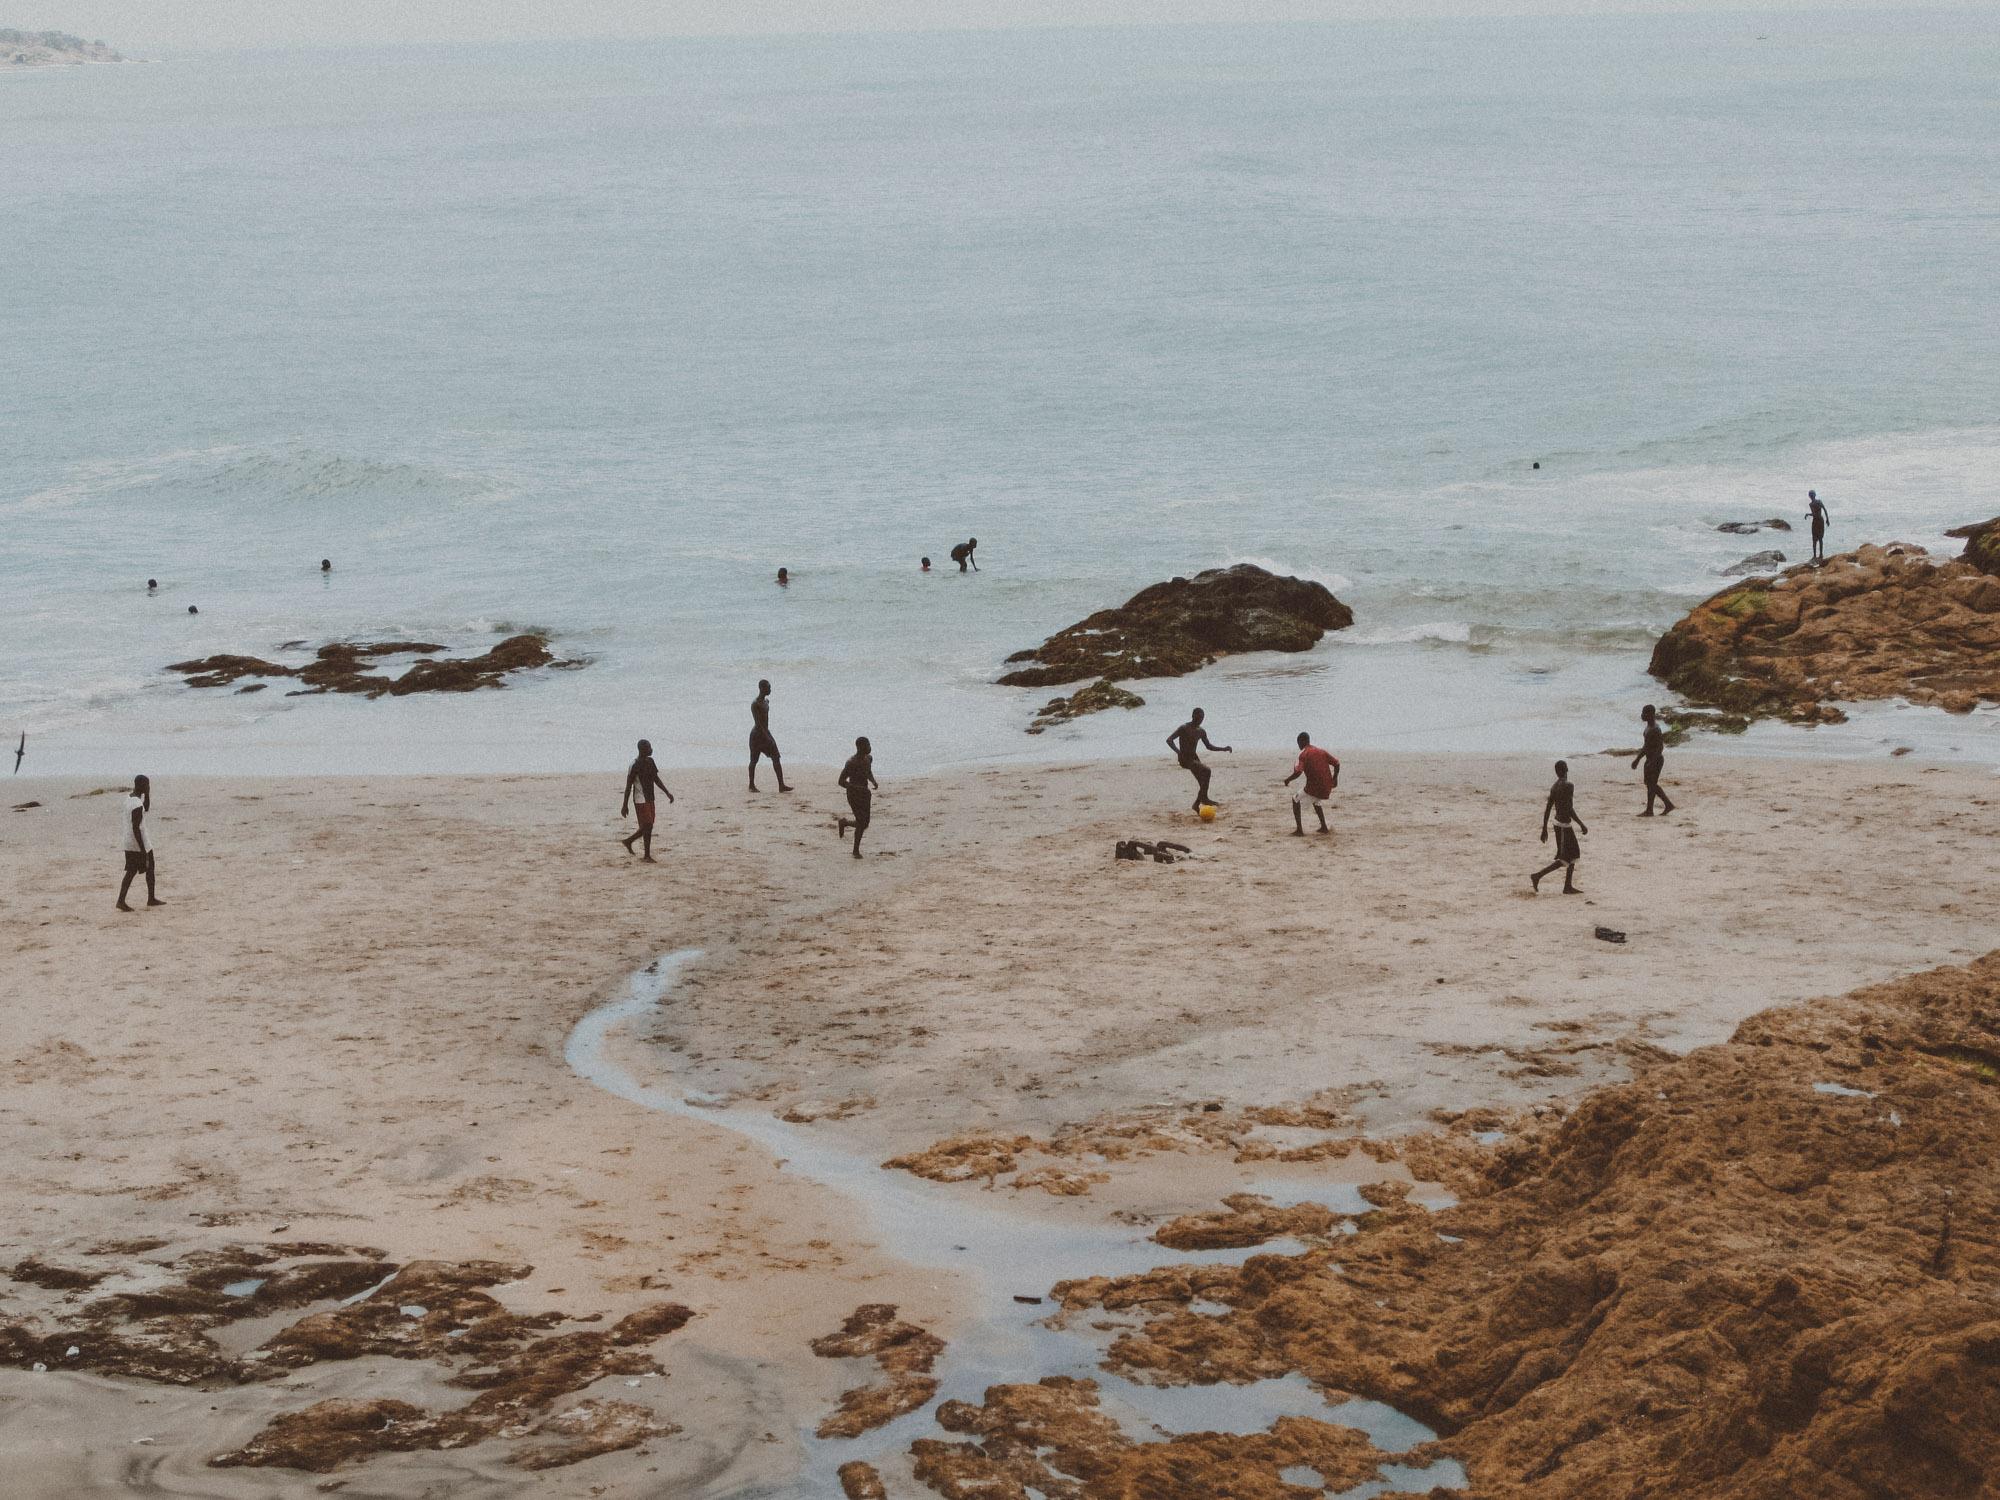 Football match in Cape Coast, Ghana | Photo by Caroline Taft,  The Brazen Gourmand